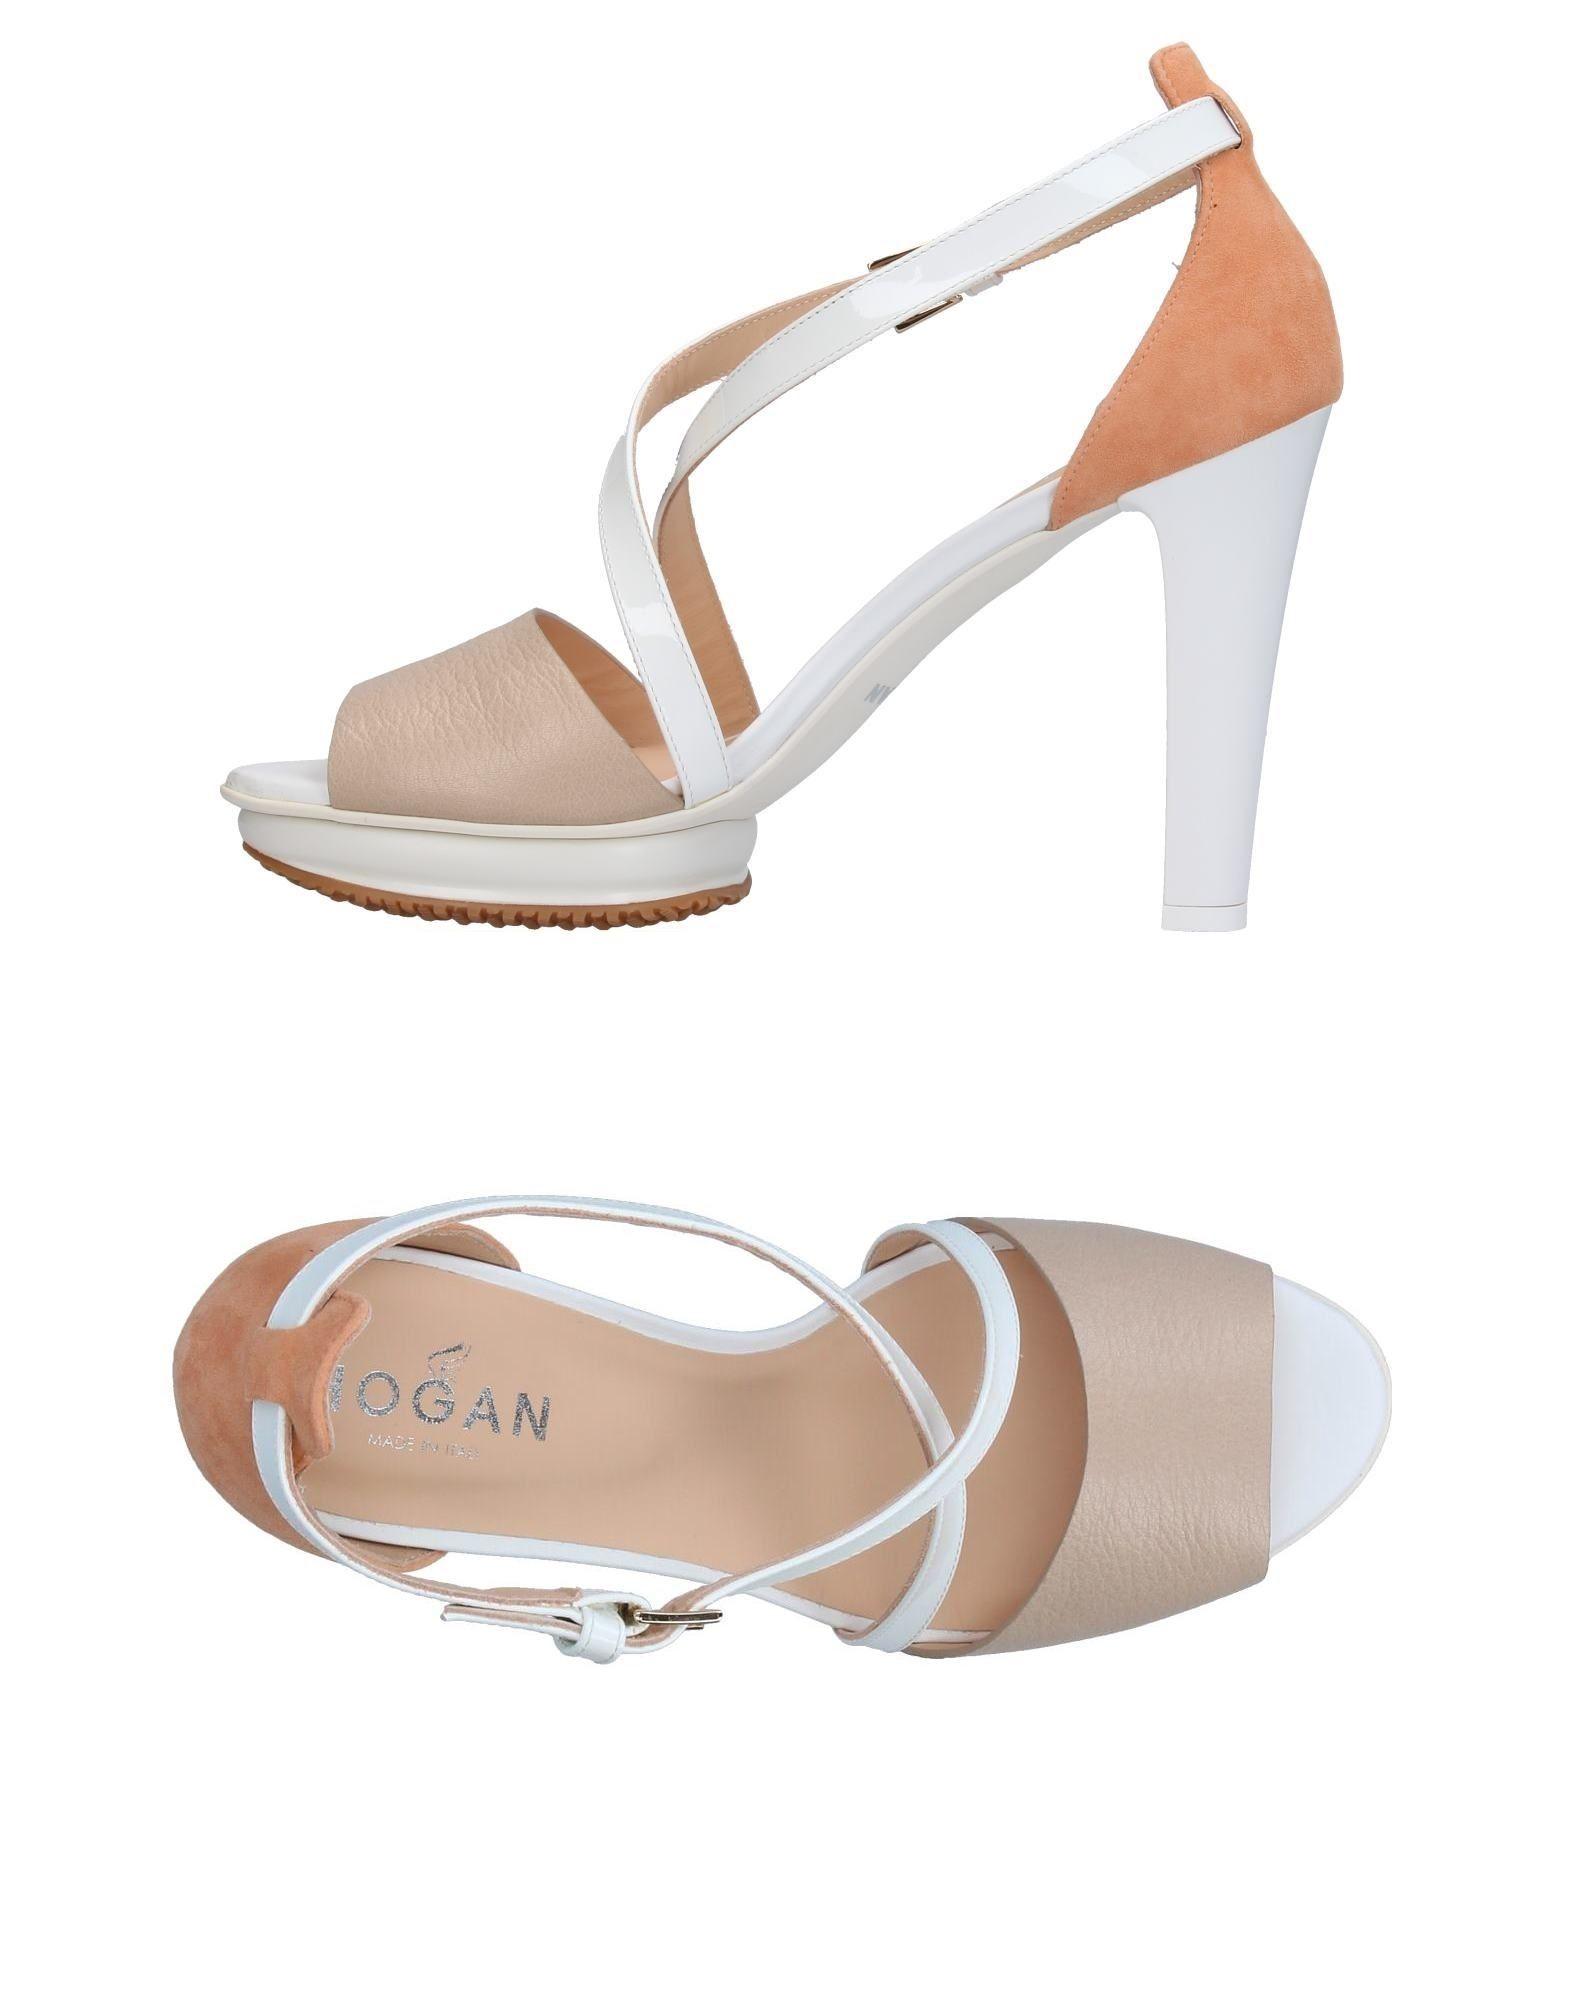 Hogan Sandalen strapazierfähige Damen  11365392PHGut aussehende strapazierfähige Sandalen Schuhe f9f0f7